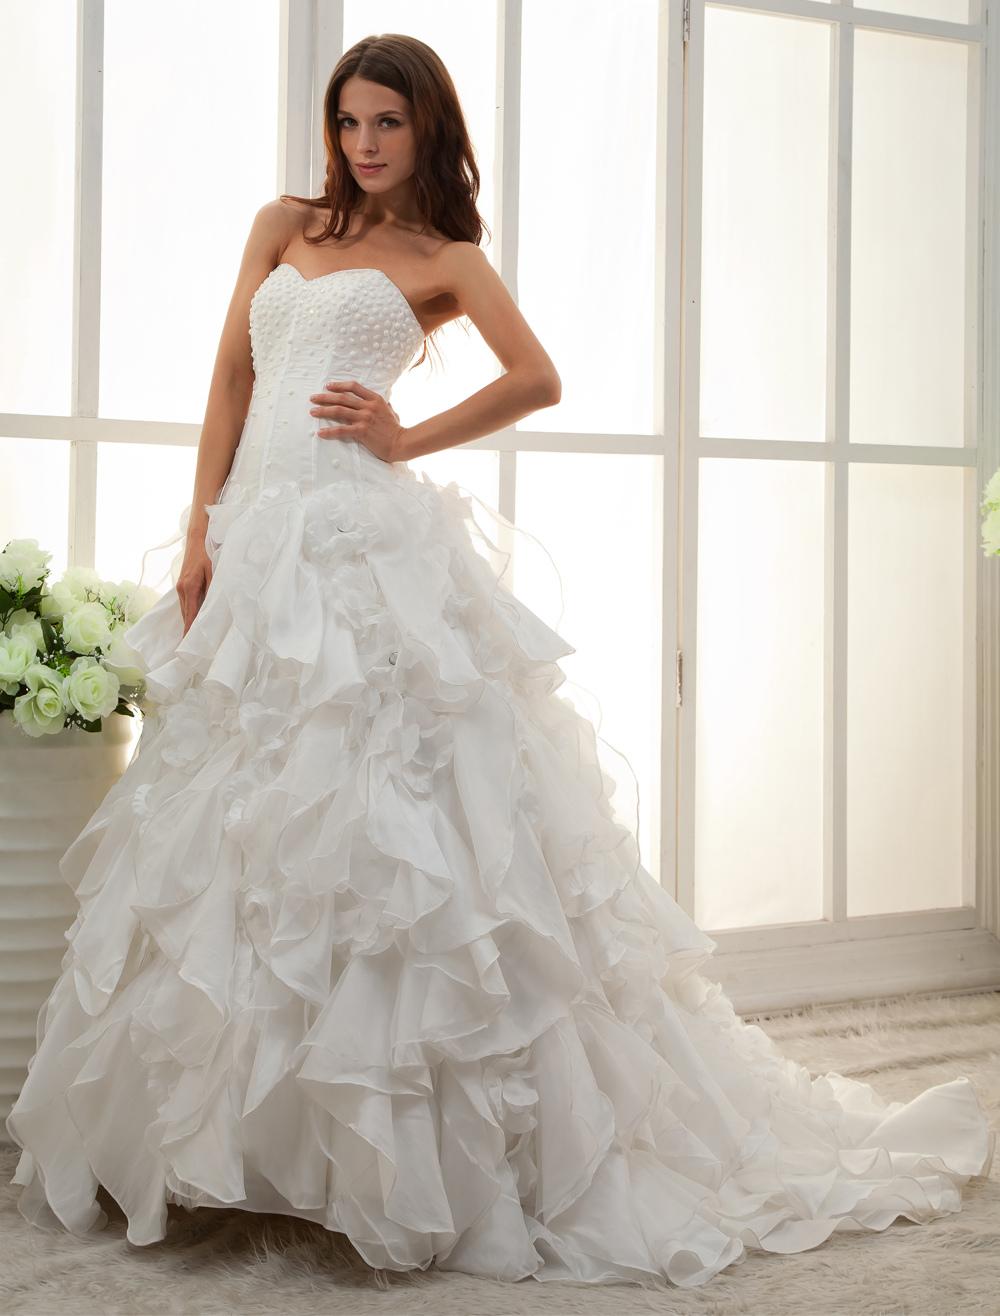 White Sweetheart Strapless A-line Beading Bridal Wedding Dress